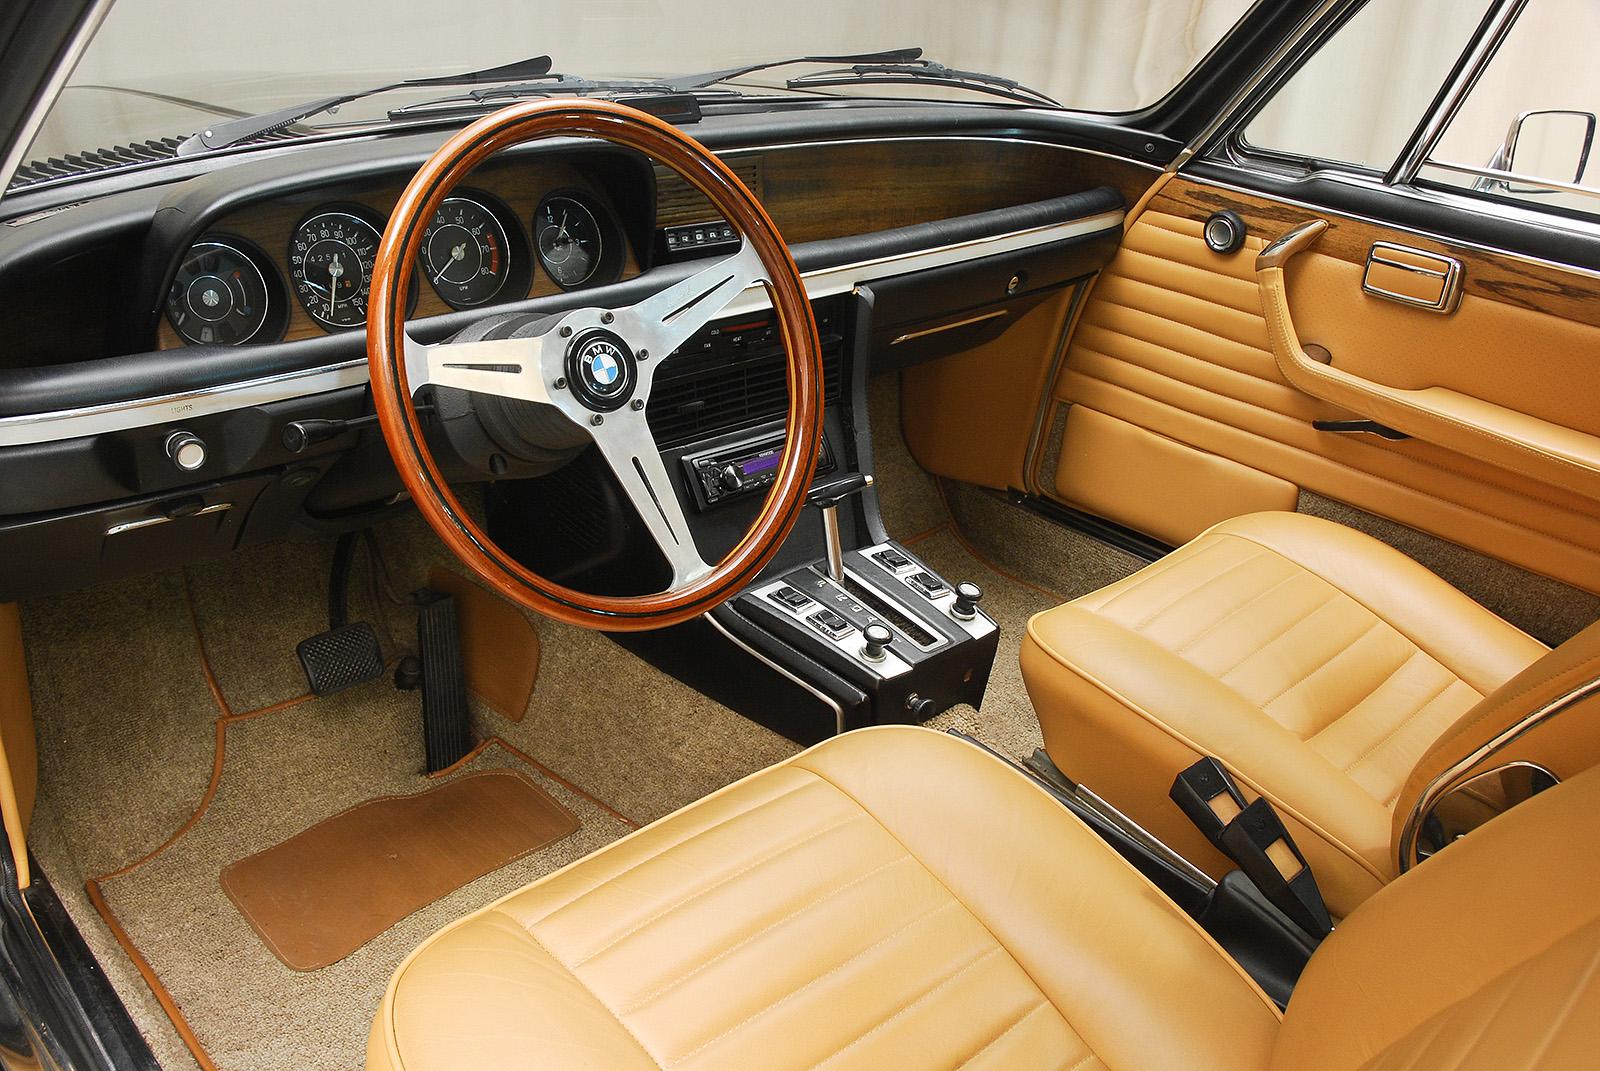 1974 bmw 3.0cs coupe E9 automatic Borg-Warner